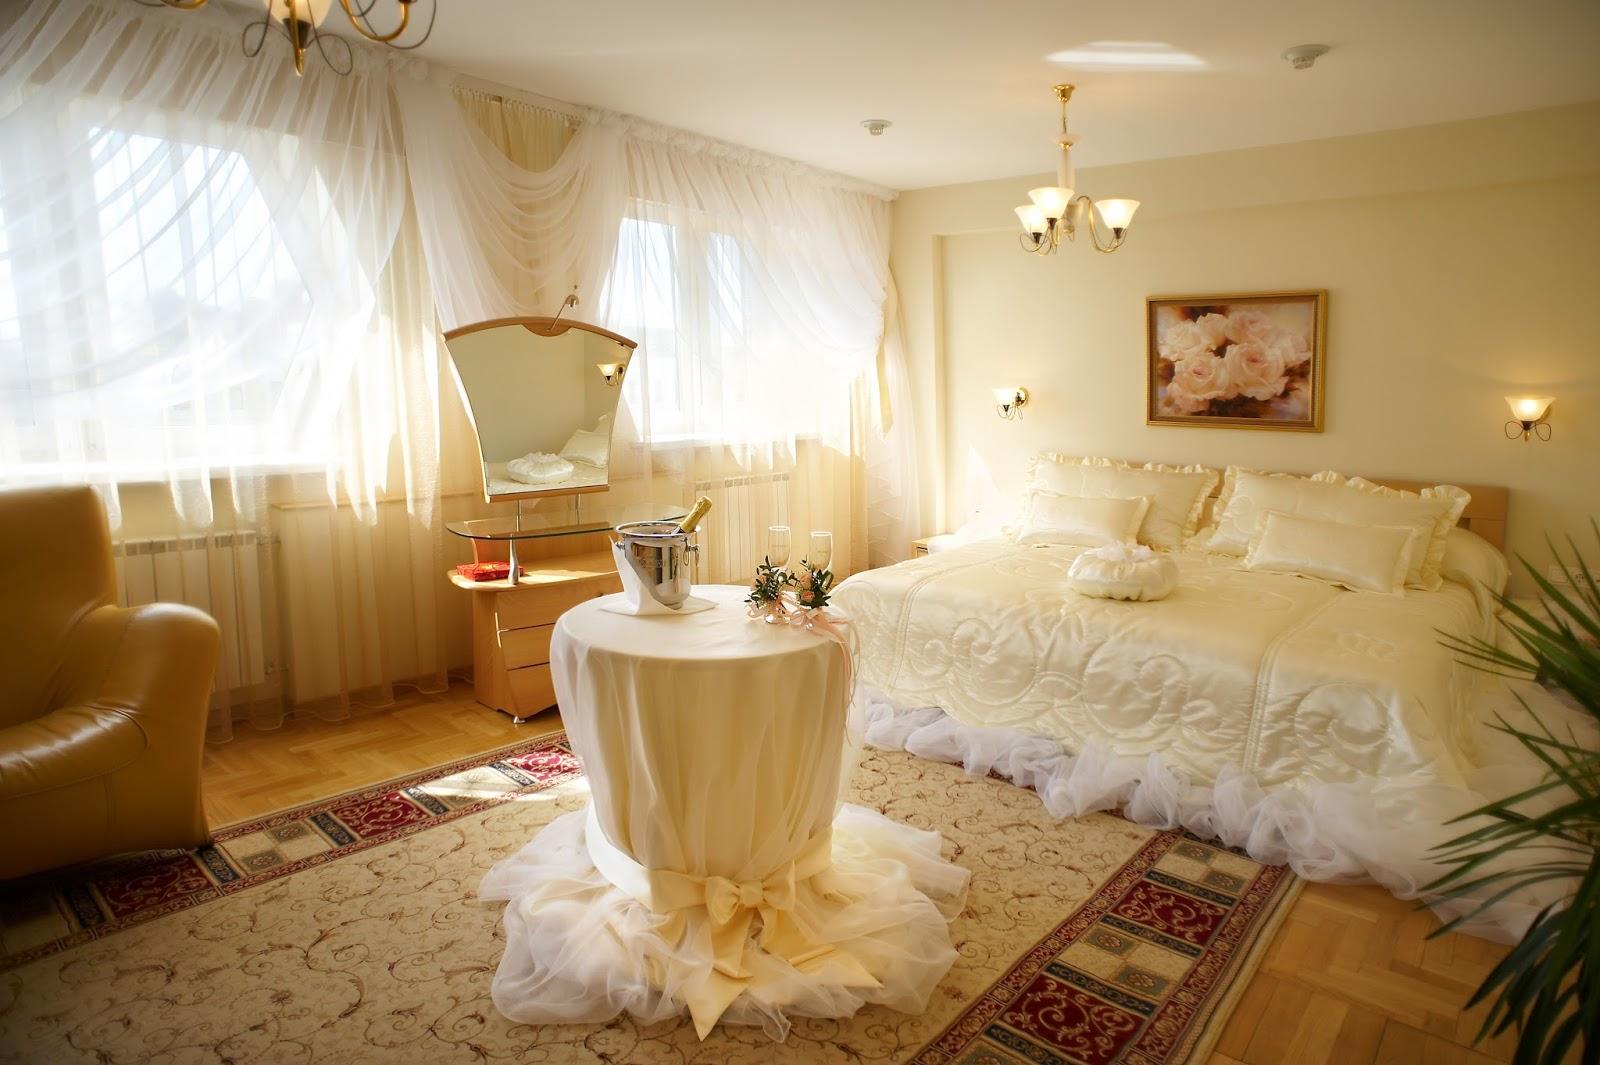 Minimalist wedding room decoration 2016 home interior 2016 for Wedding room decoration